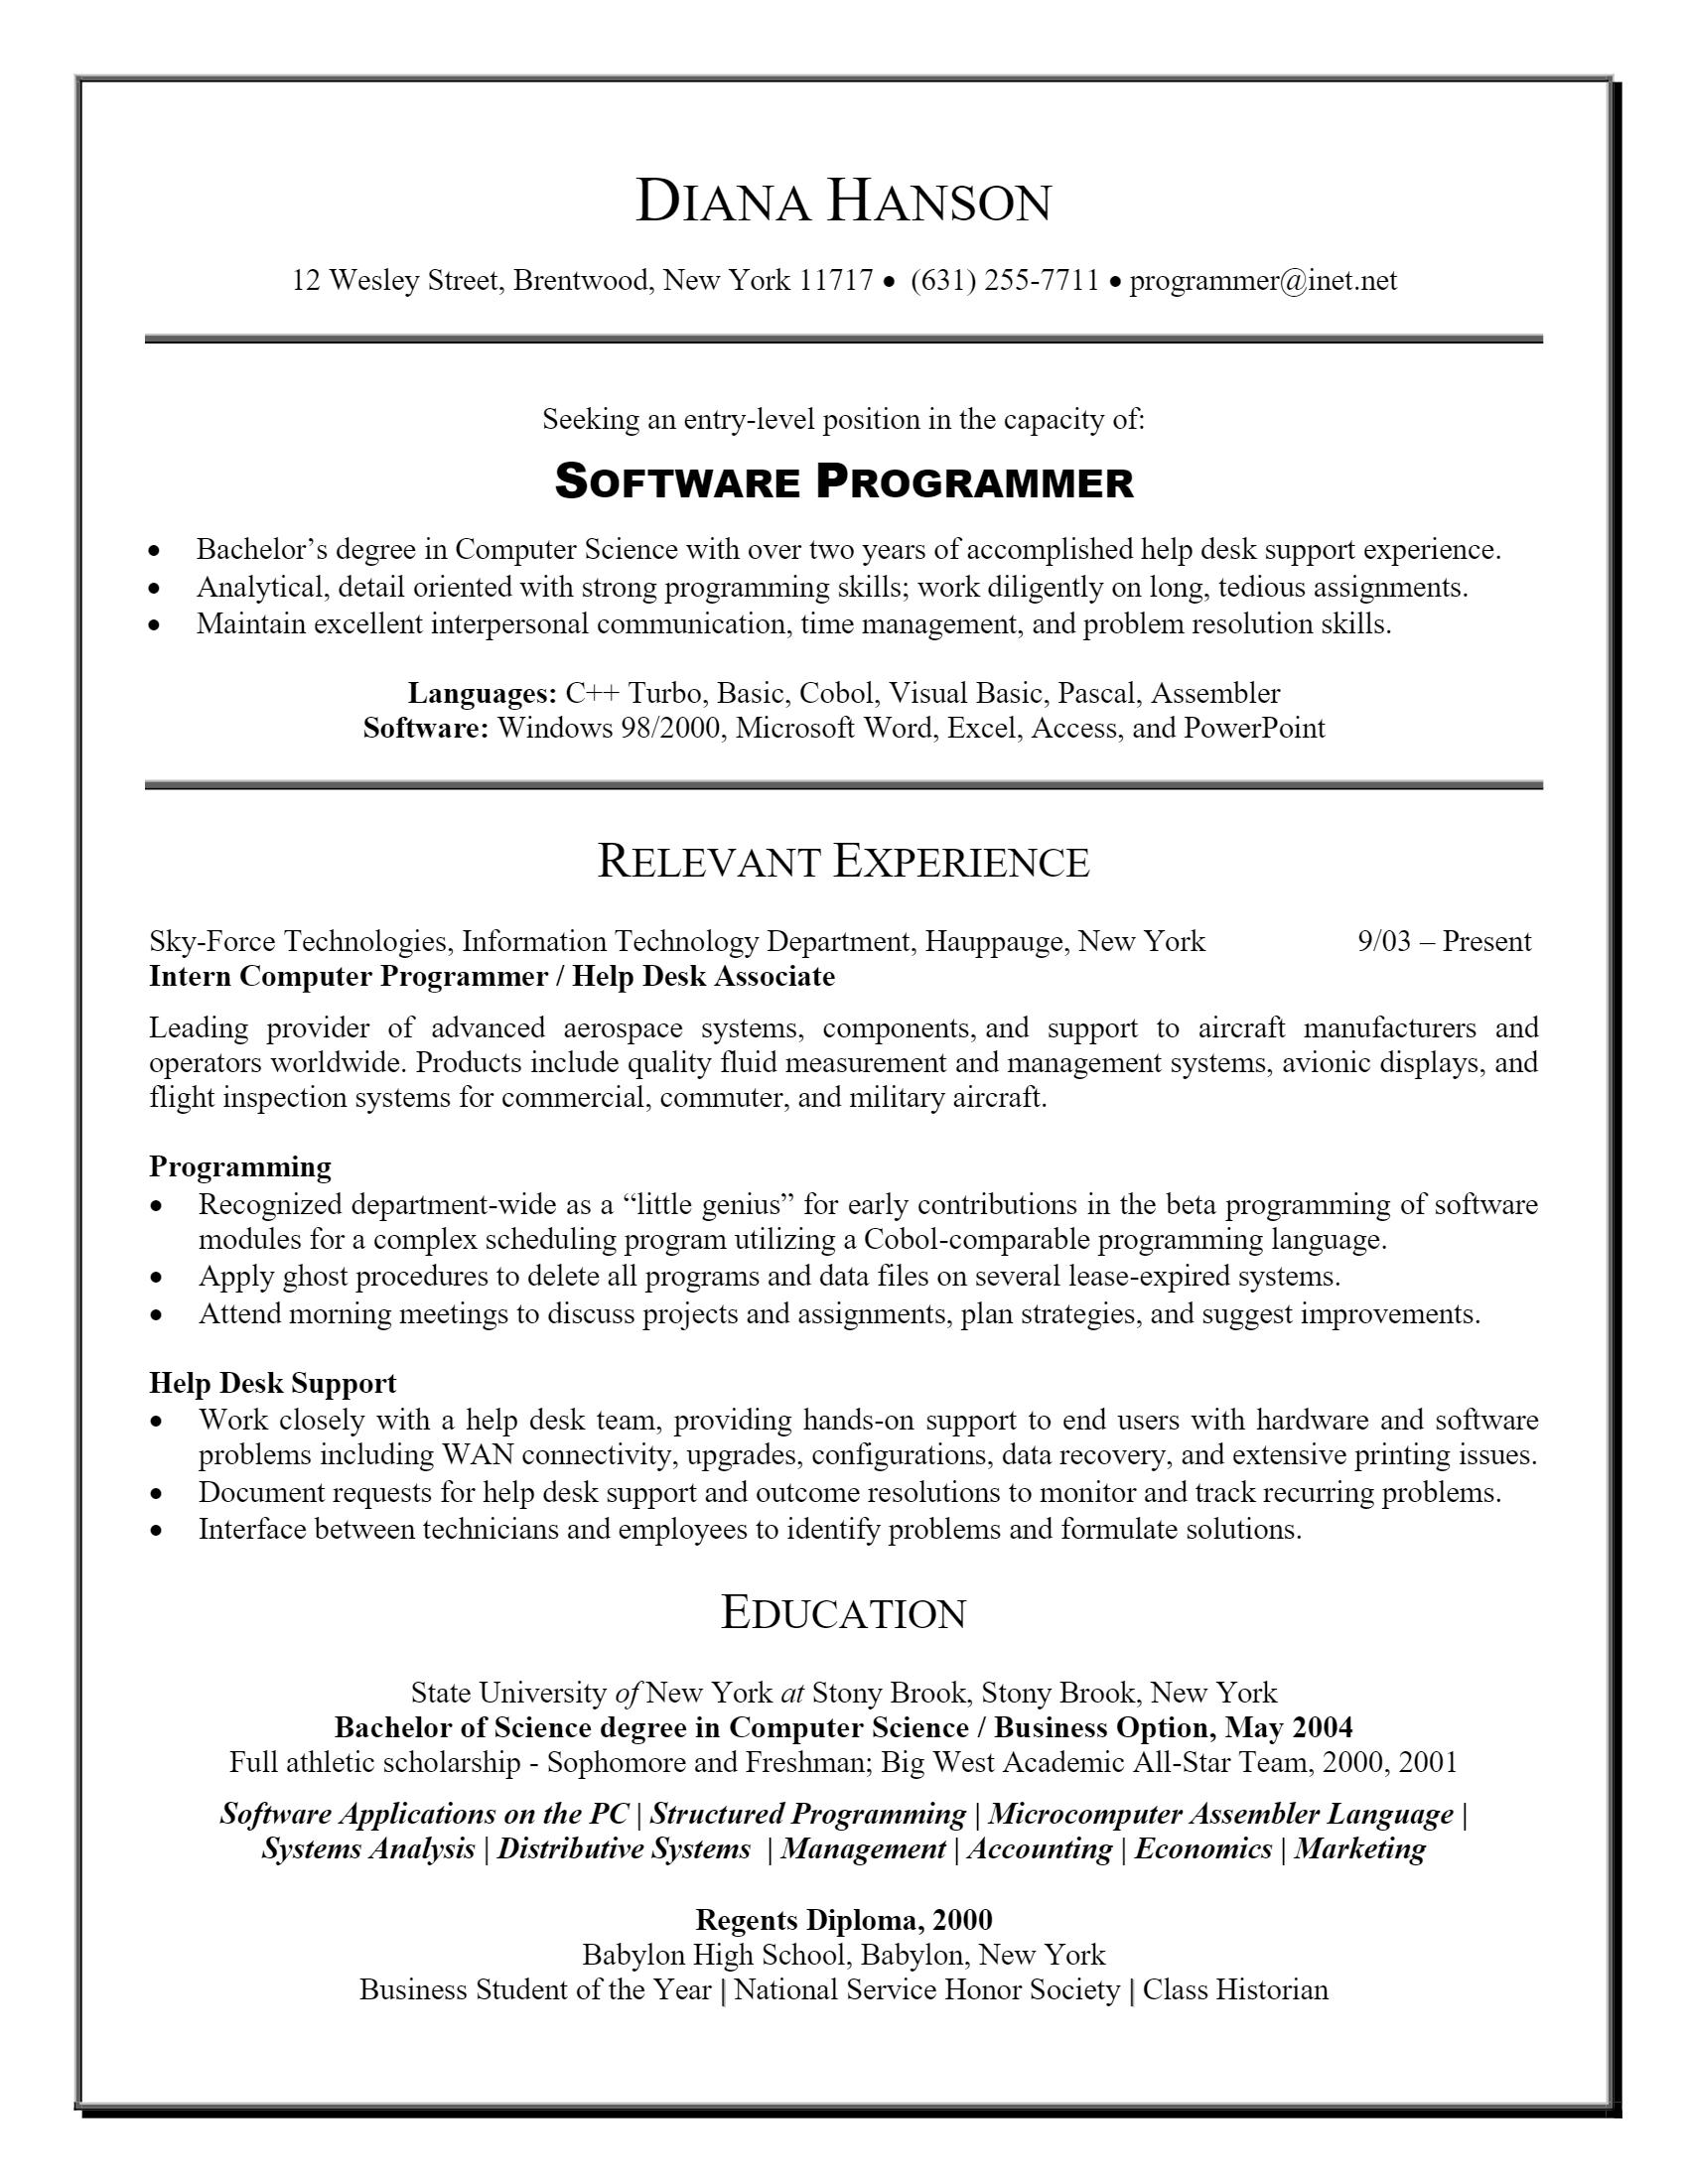 Software Programmer Resume .Docx (Word)